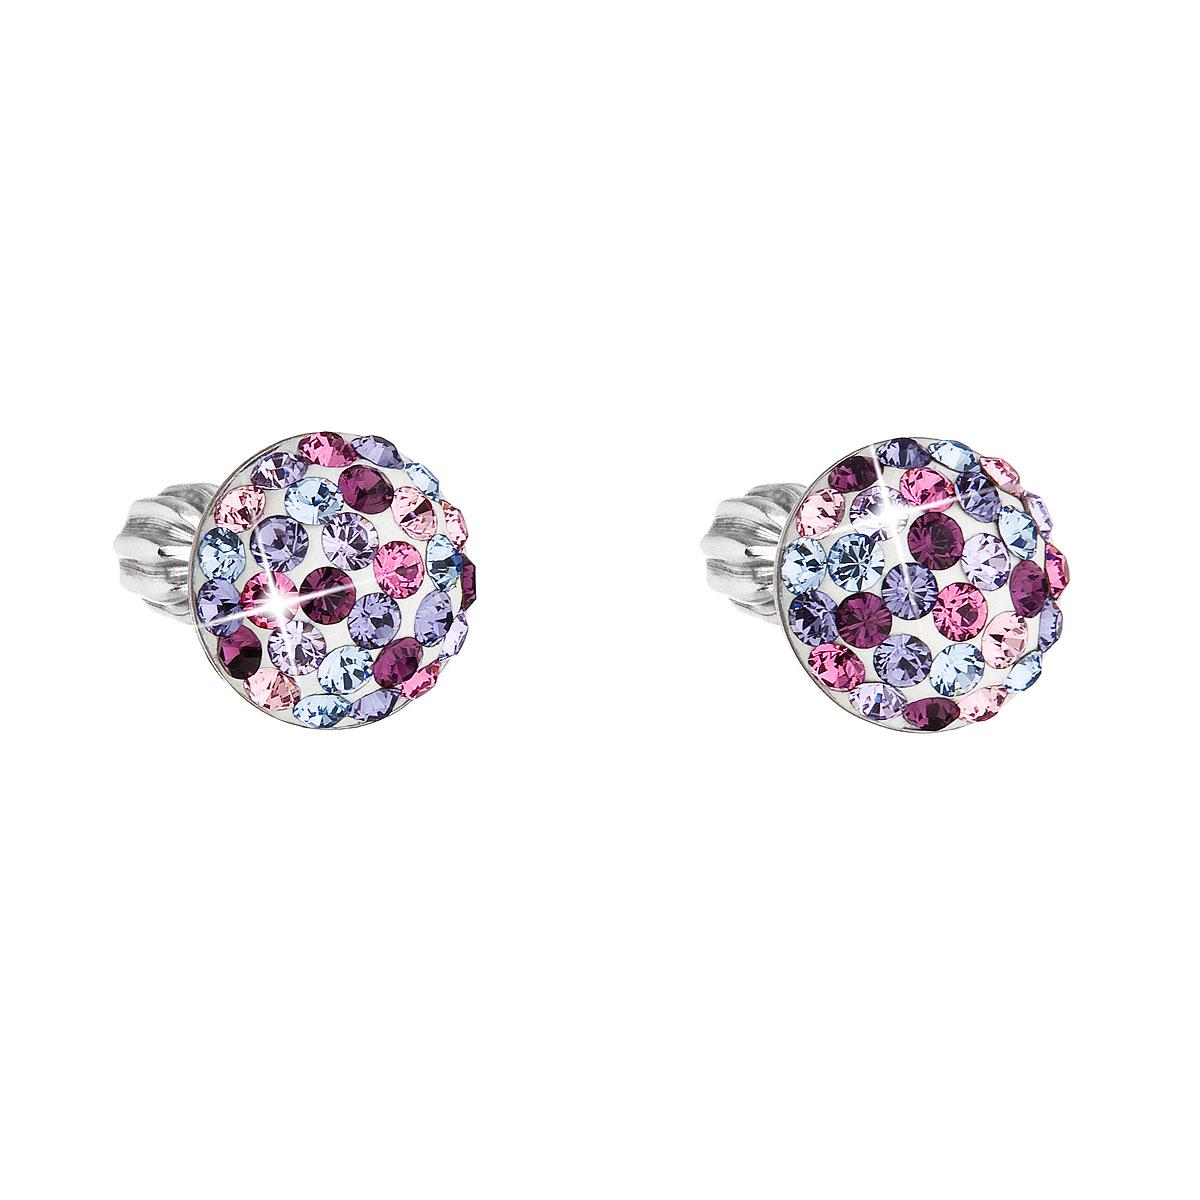 Strieborné náušnice perličky s krištálmi Swarovski mix fialové okrúhle 31336.3